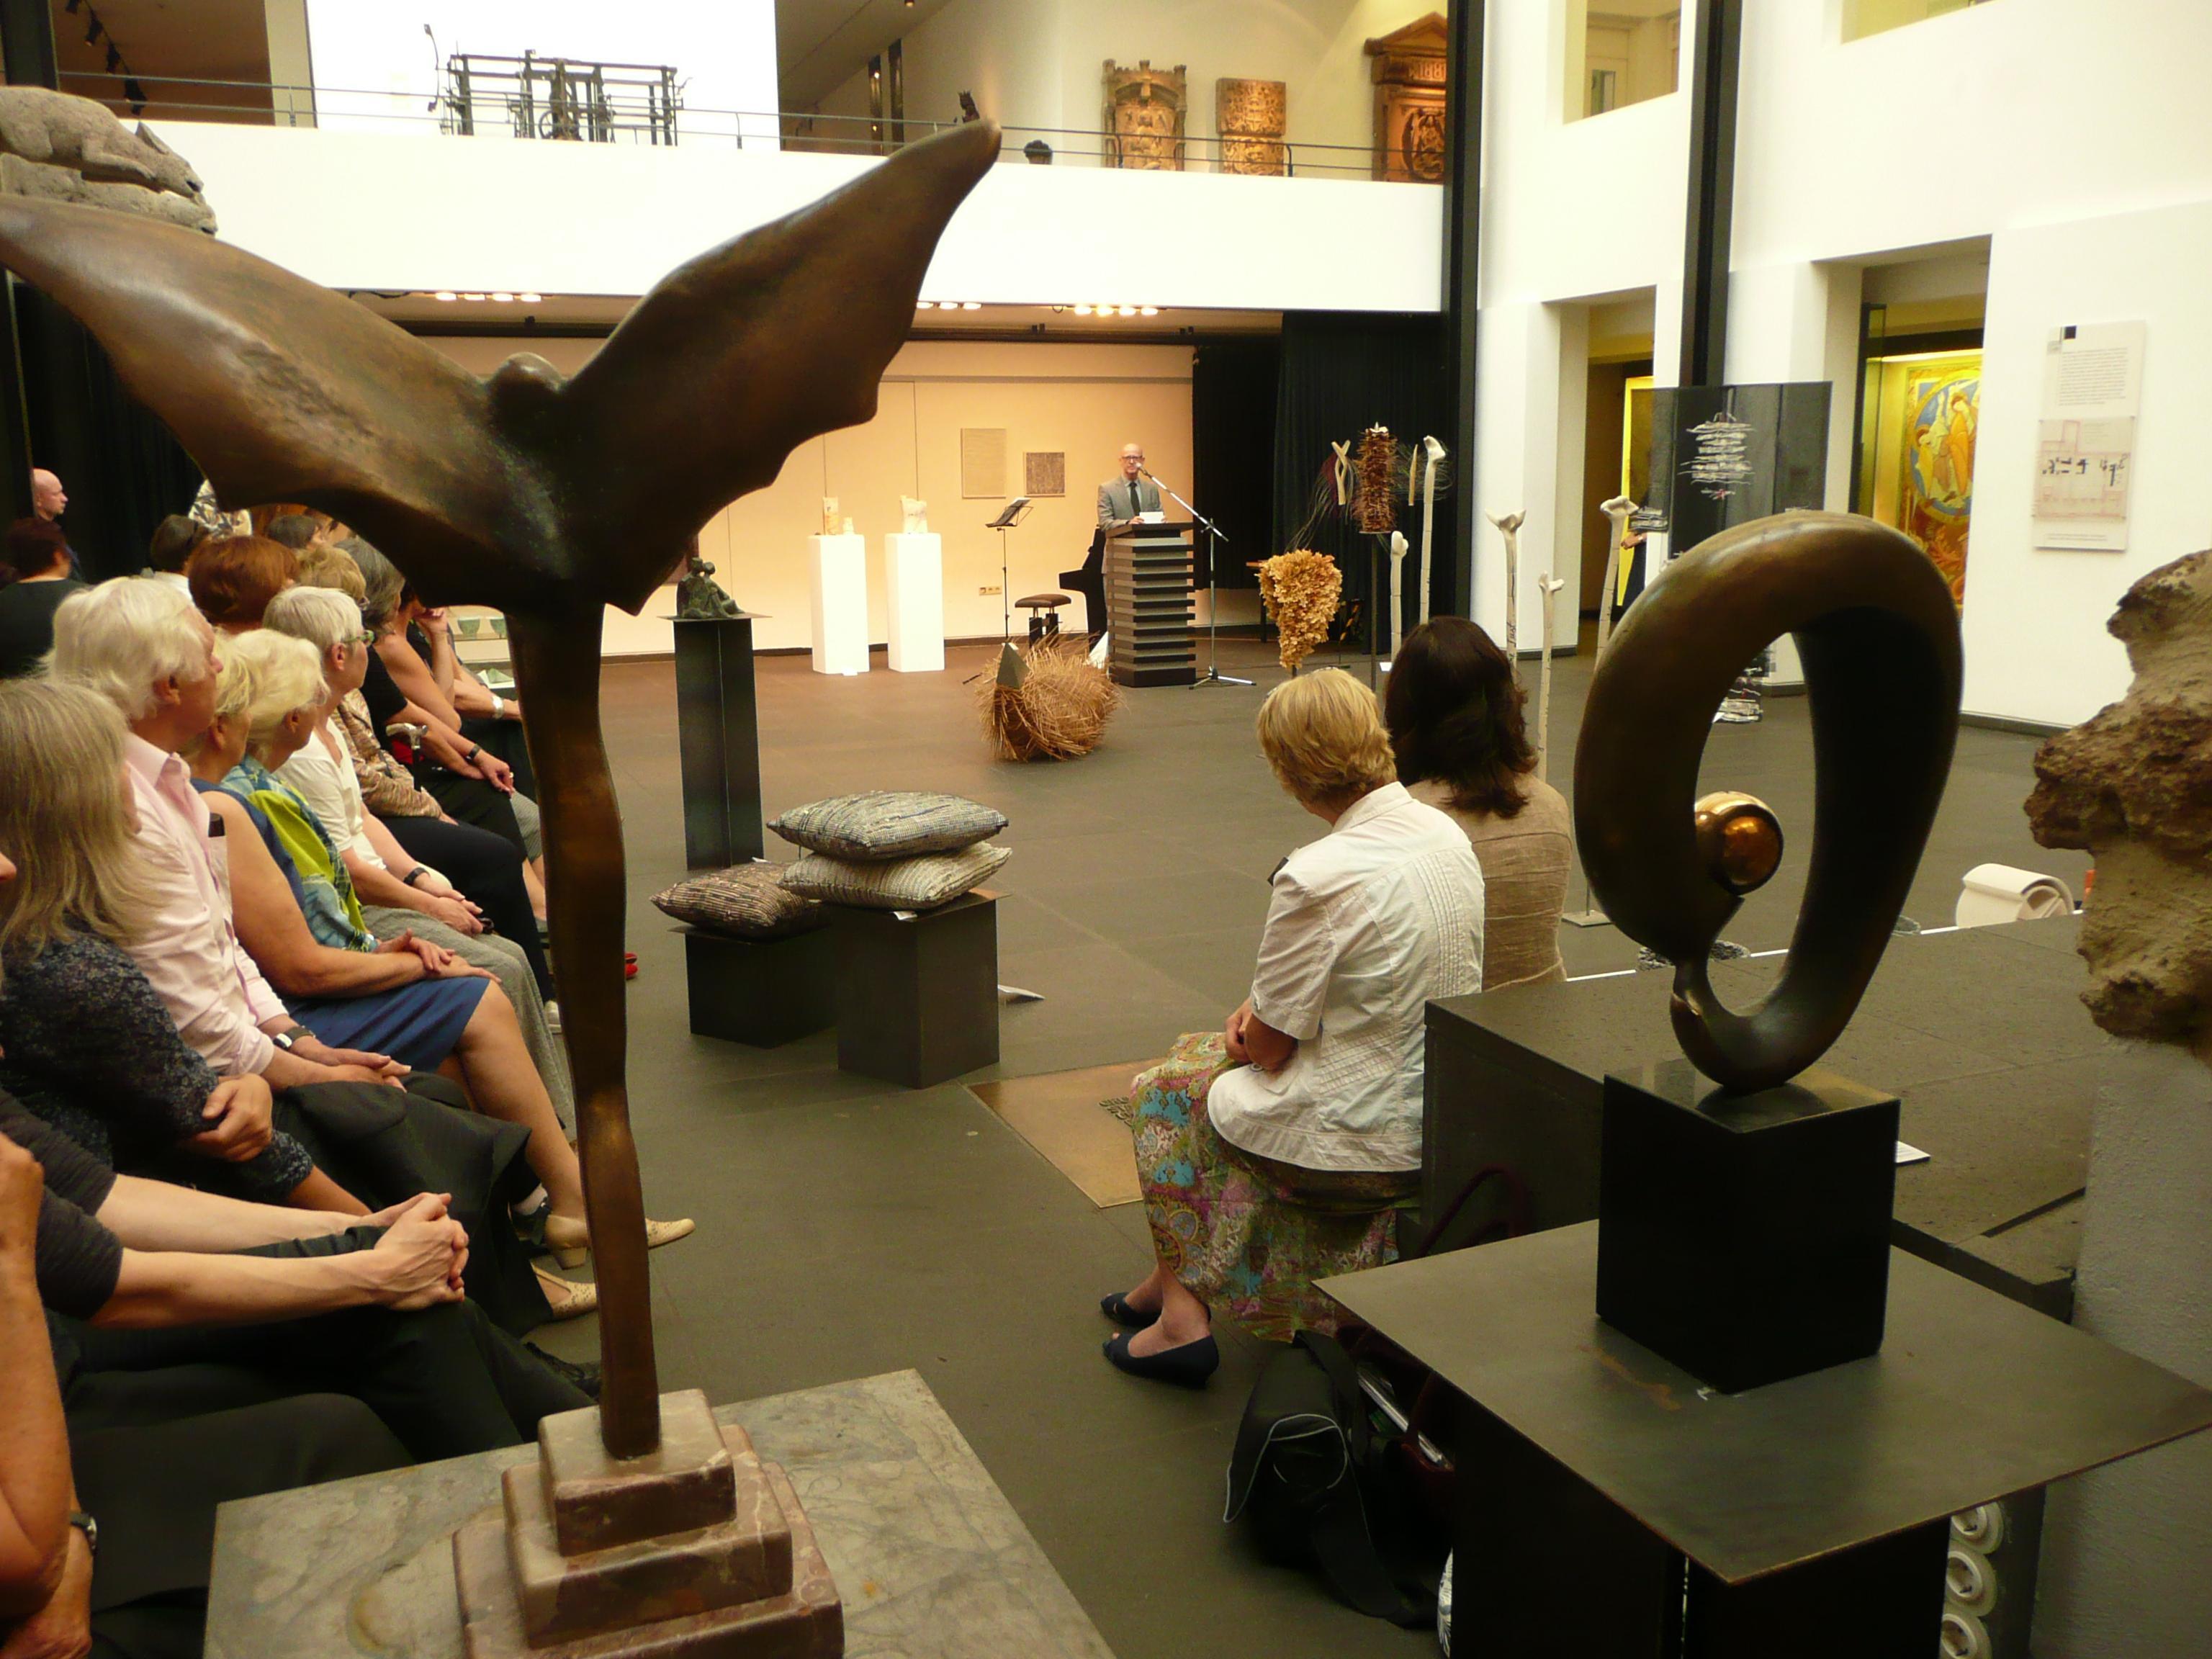 Empfang bzw. Ausstellungseröffnung im Forum des Museums.